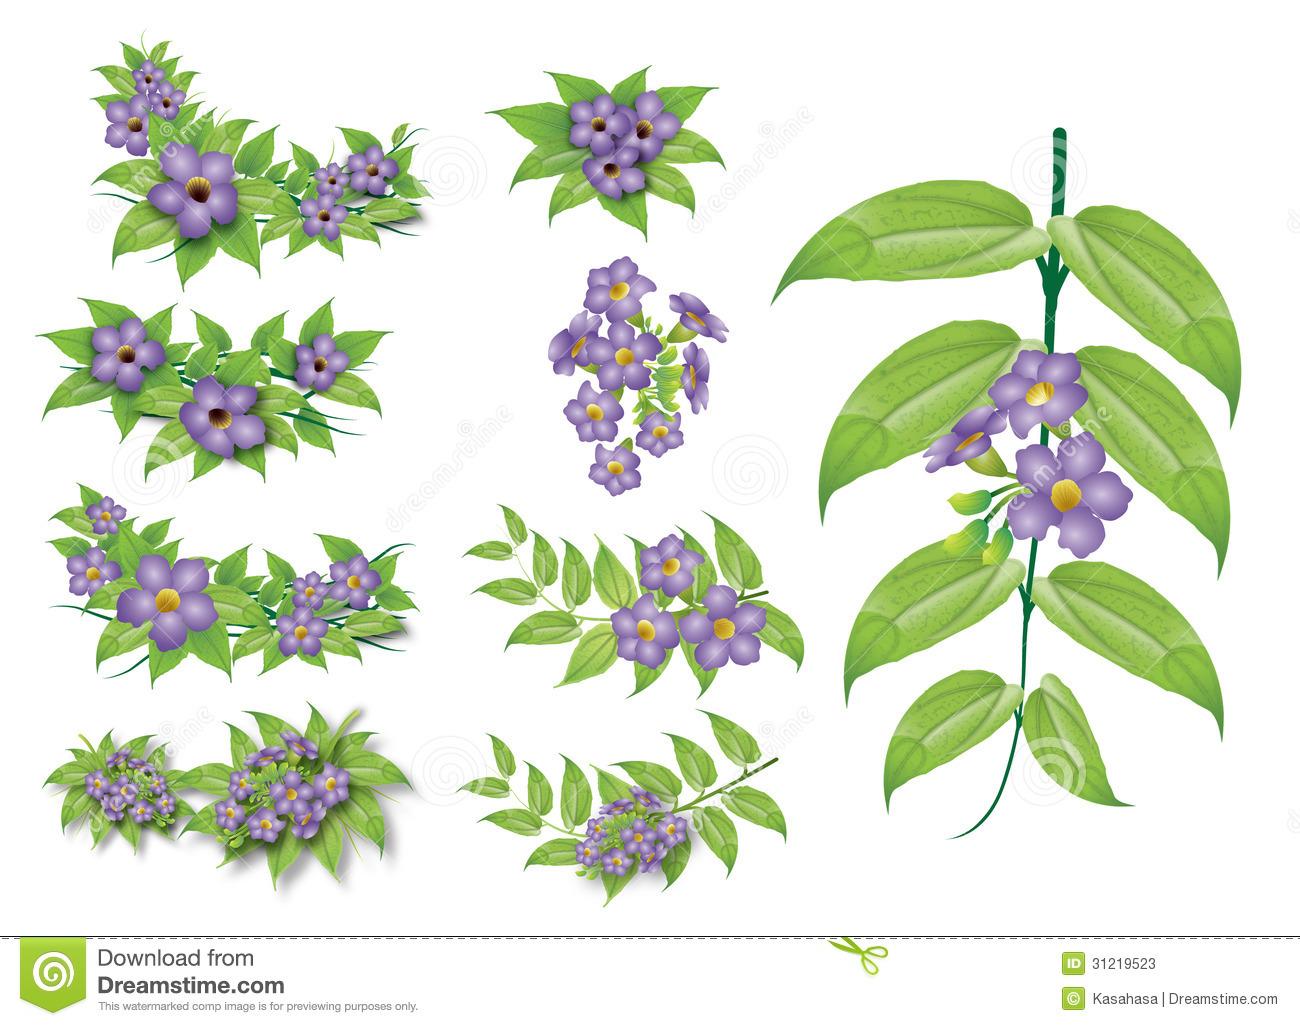 Bill (Thunbergia Laurifolia Linn.) Stock Photos.